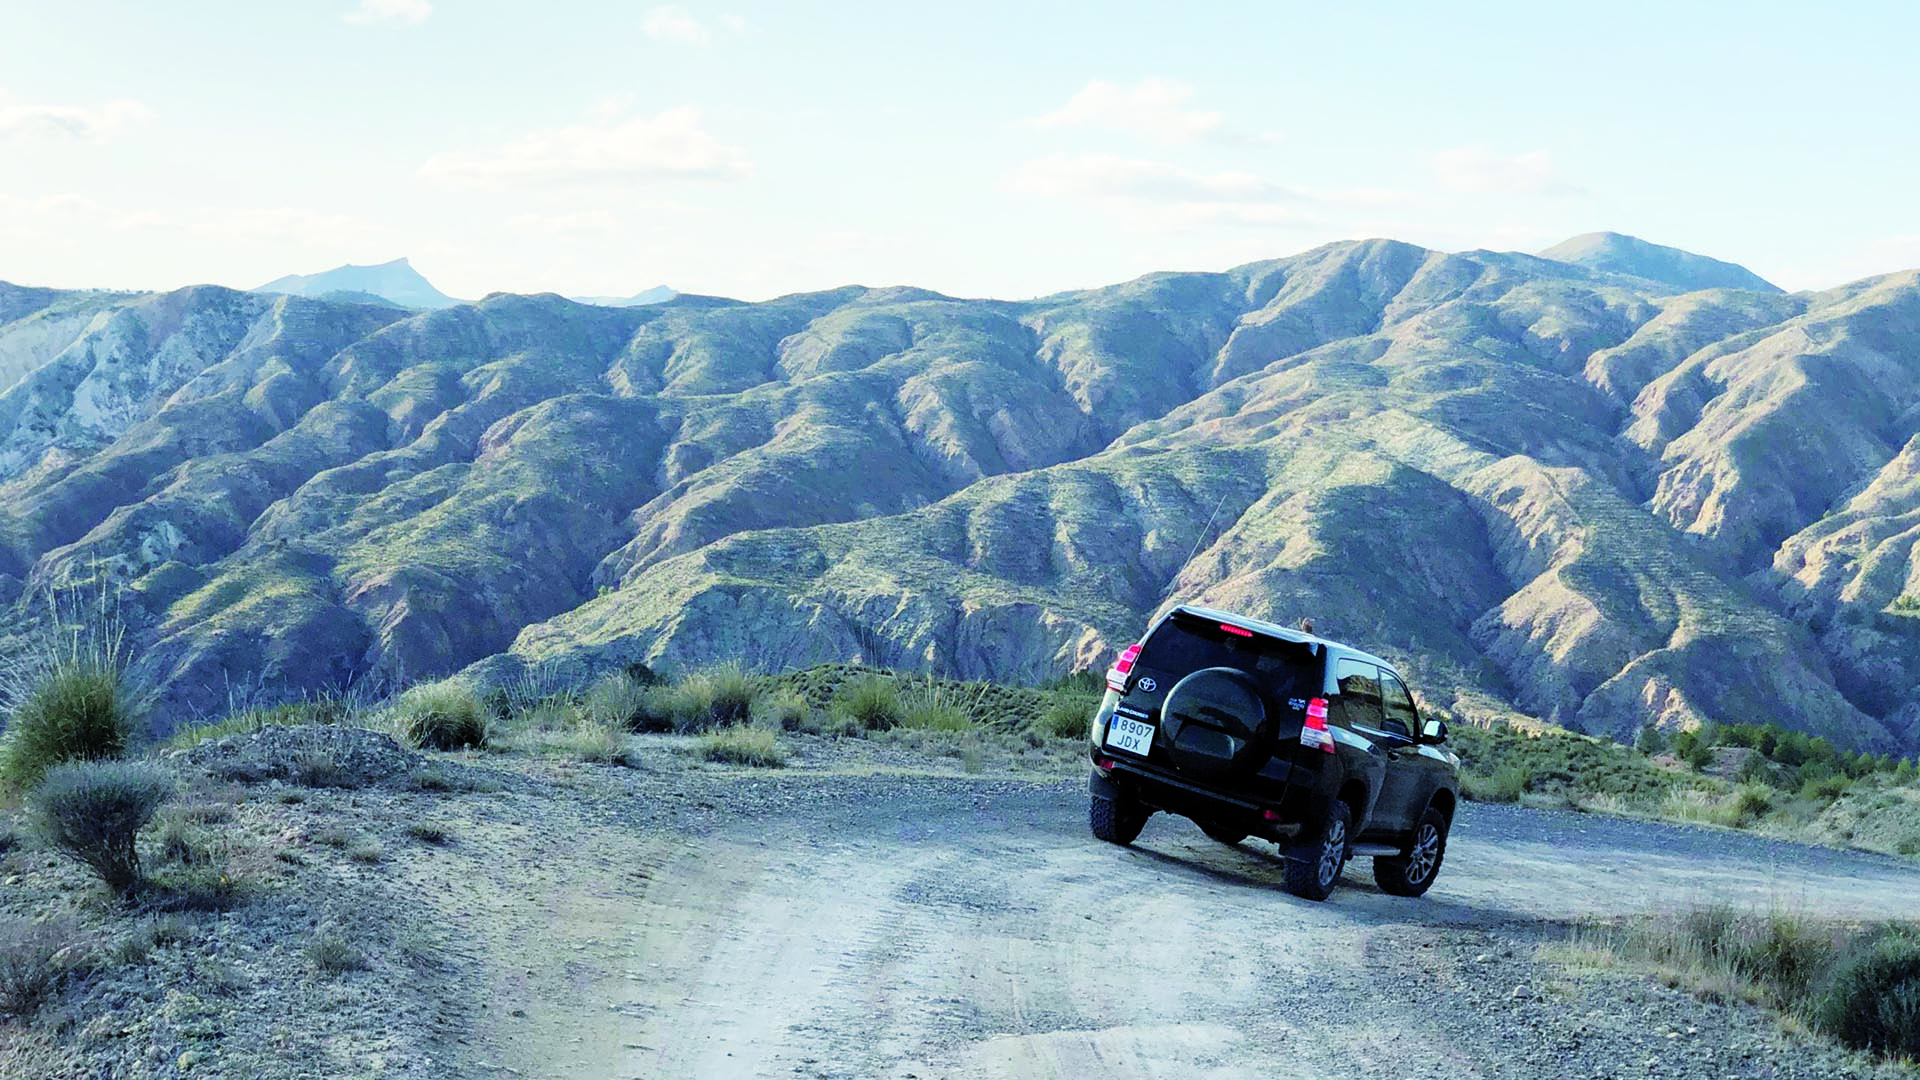 Ruta TT Sierra y desiertos Andalucía